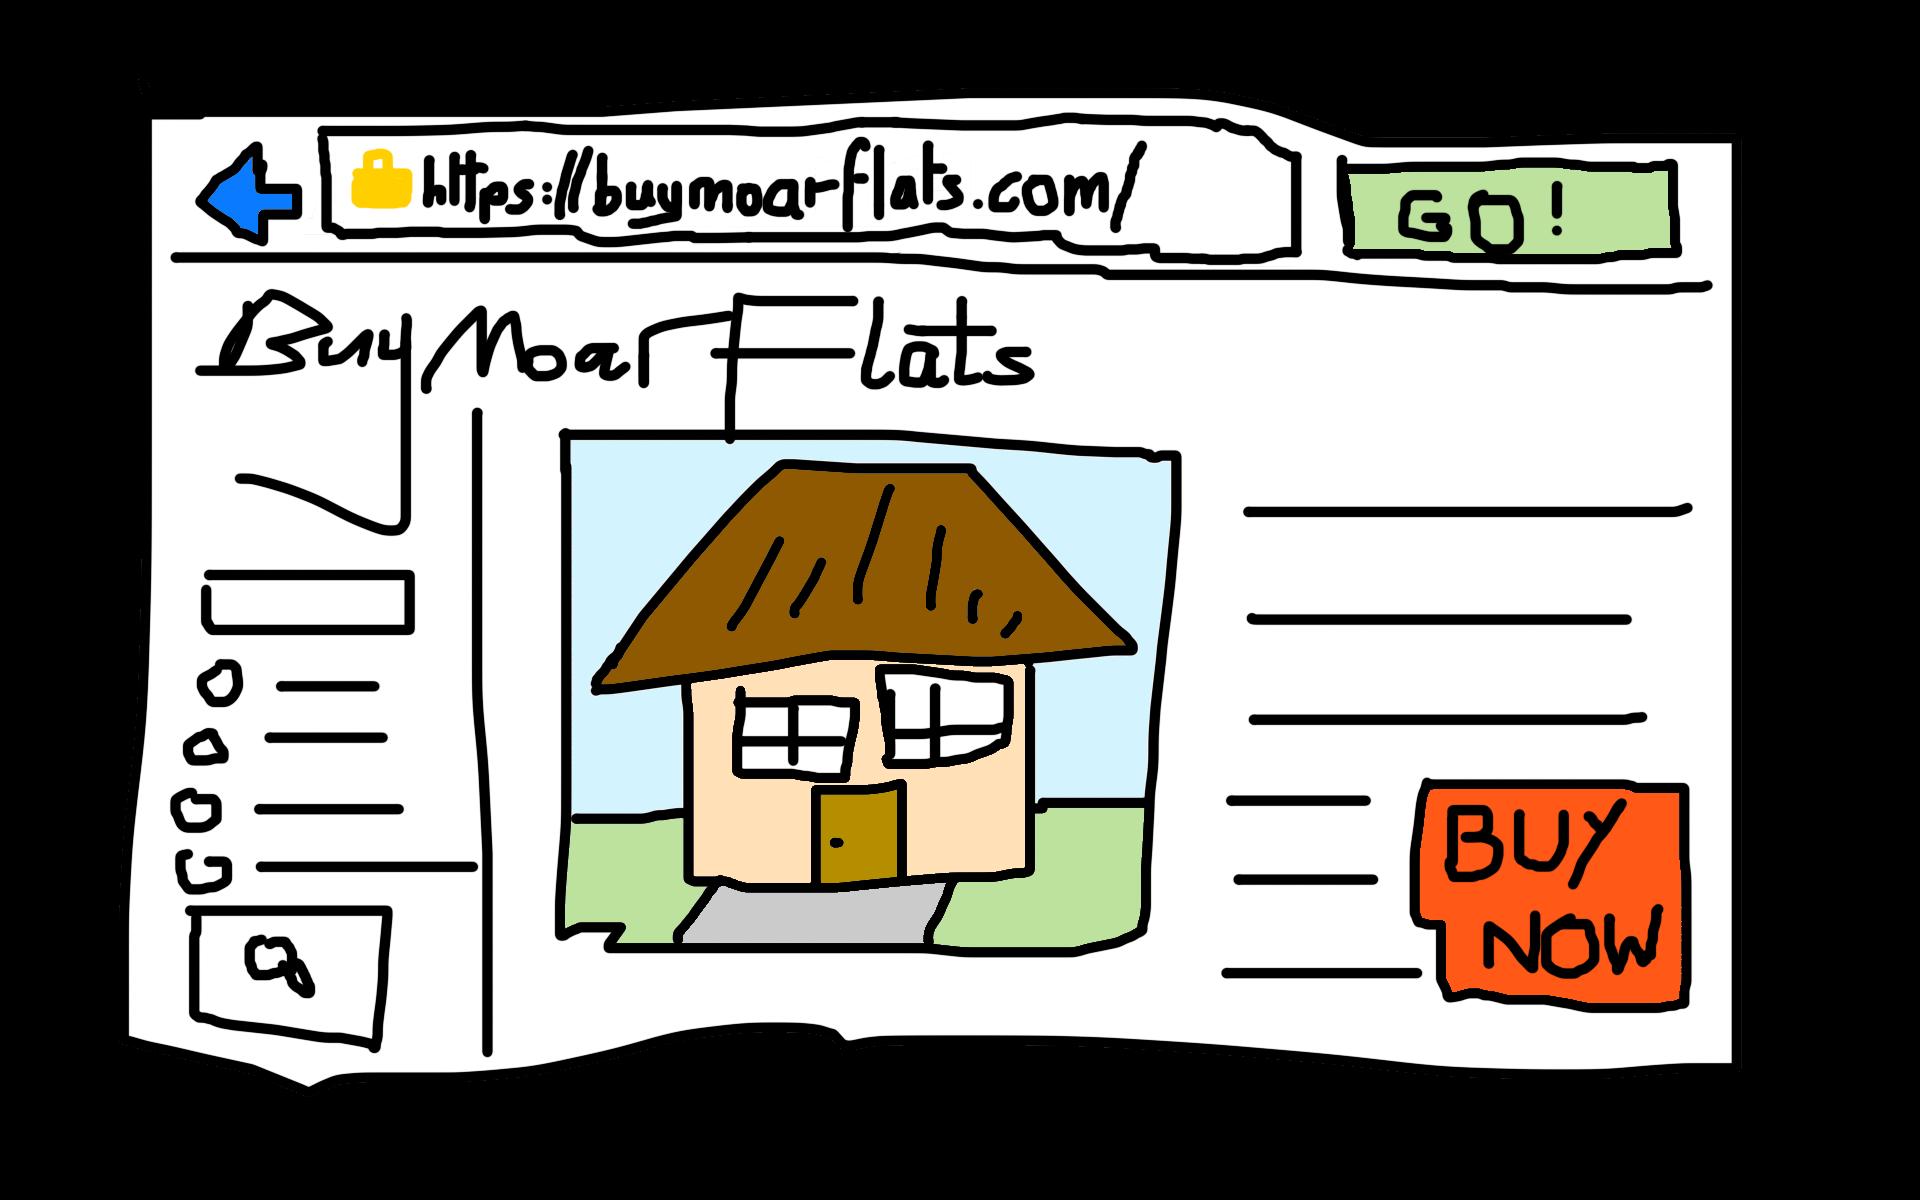 BuyMoarFlats.com